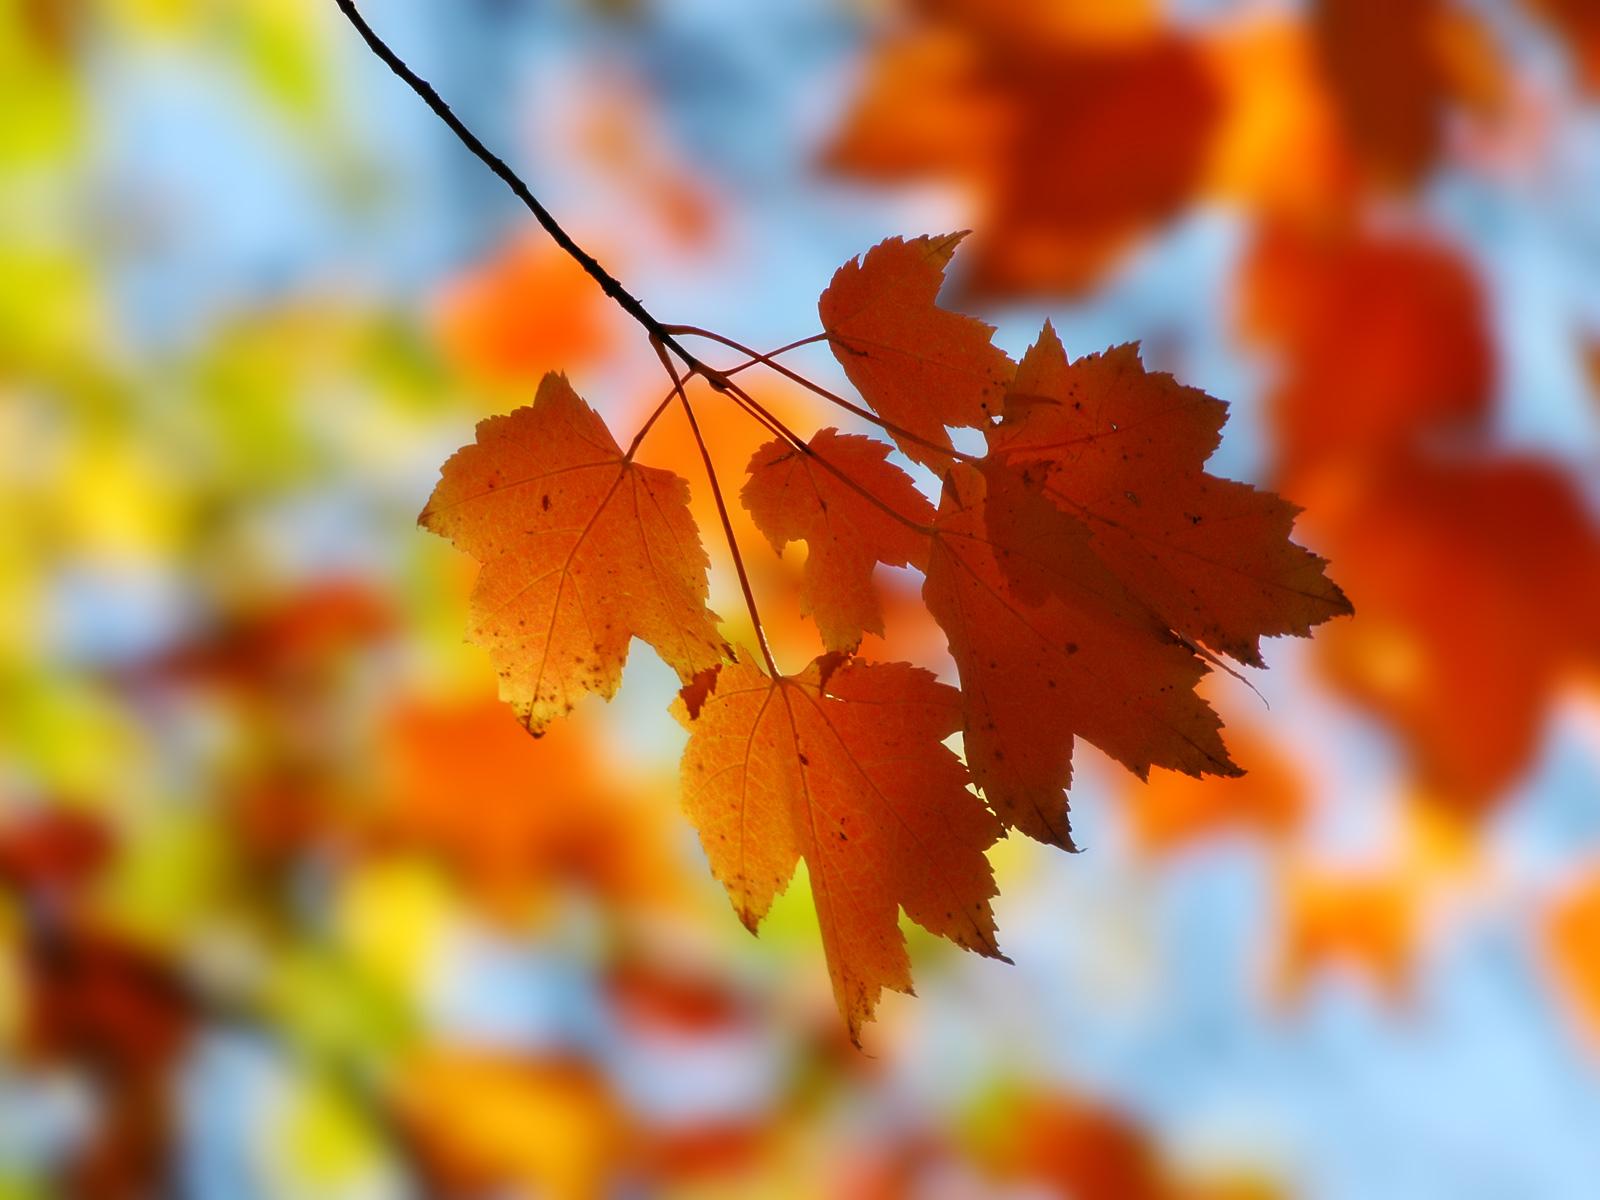 Autumn Leaves Border Frame Free Stock Images